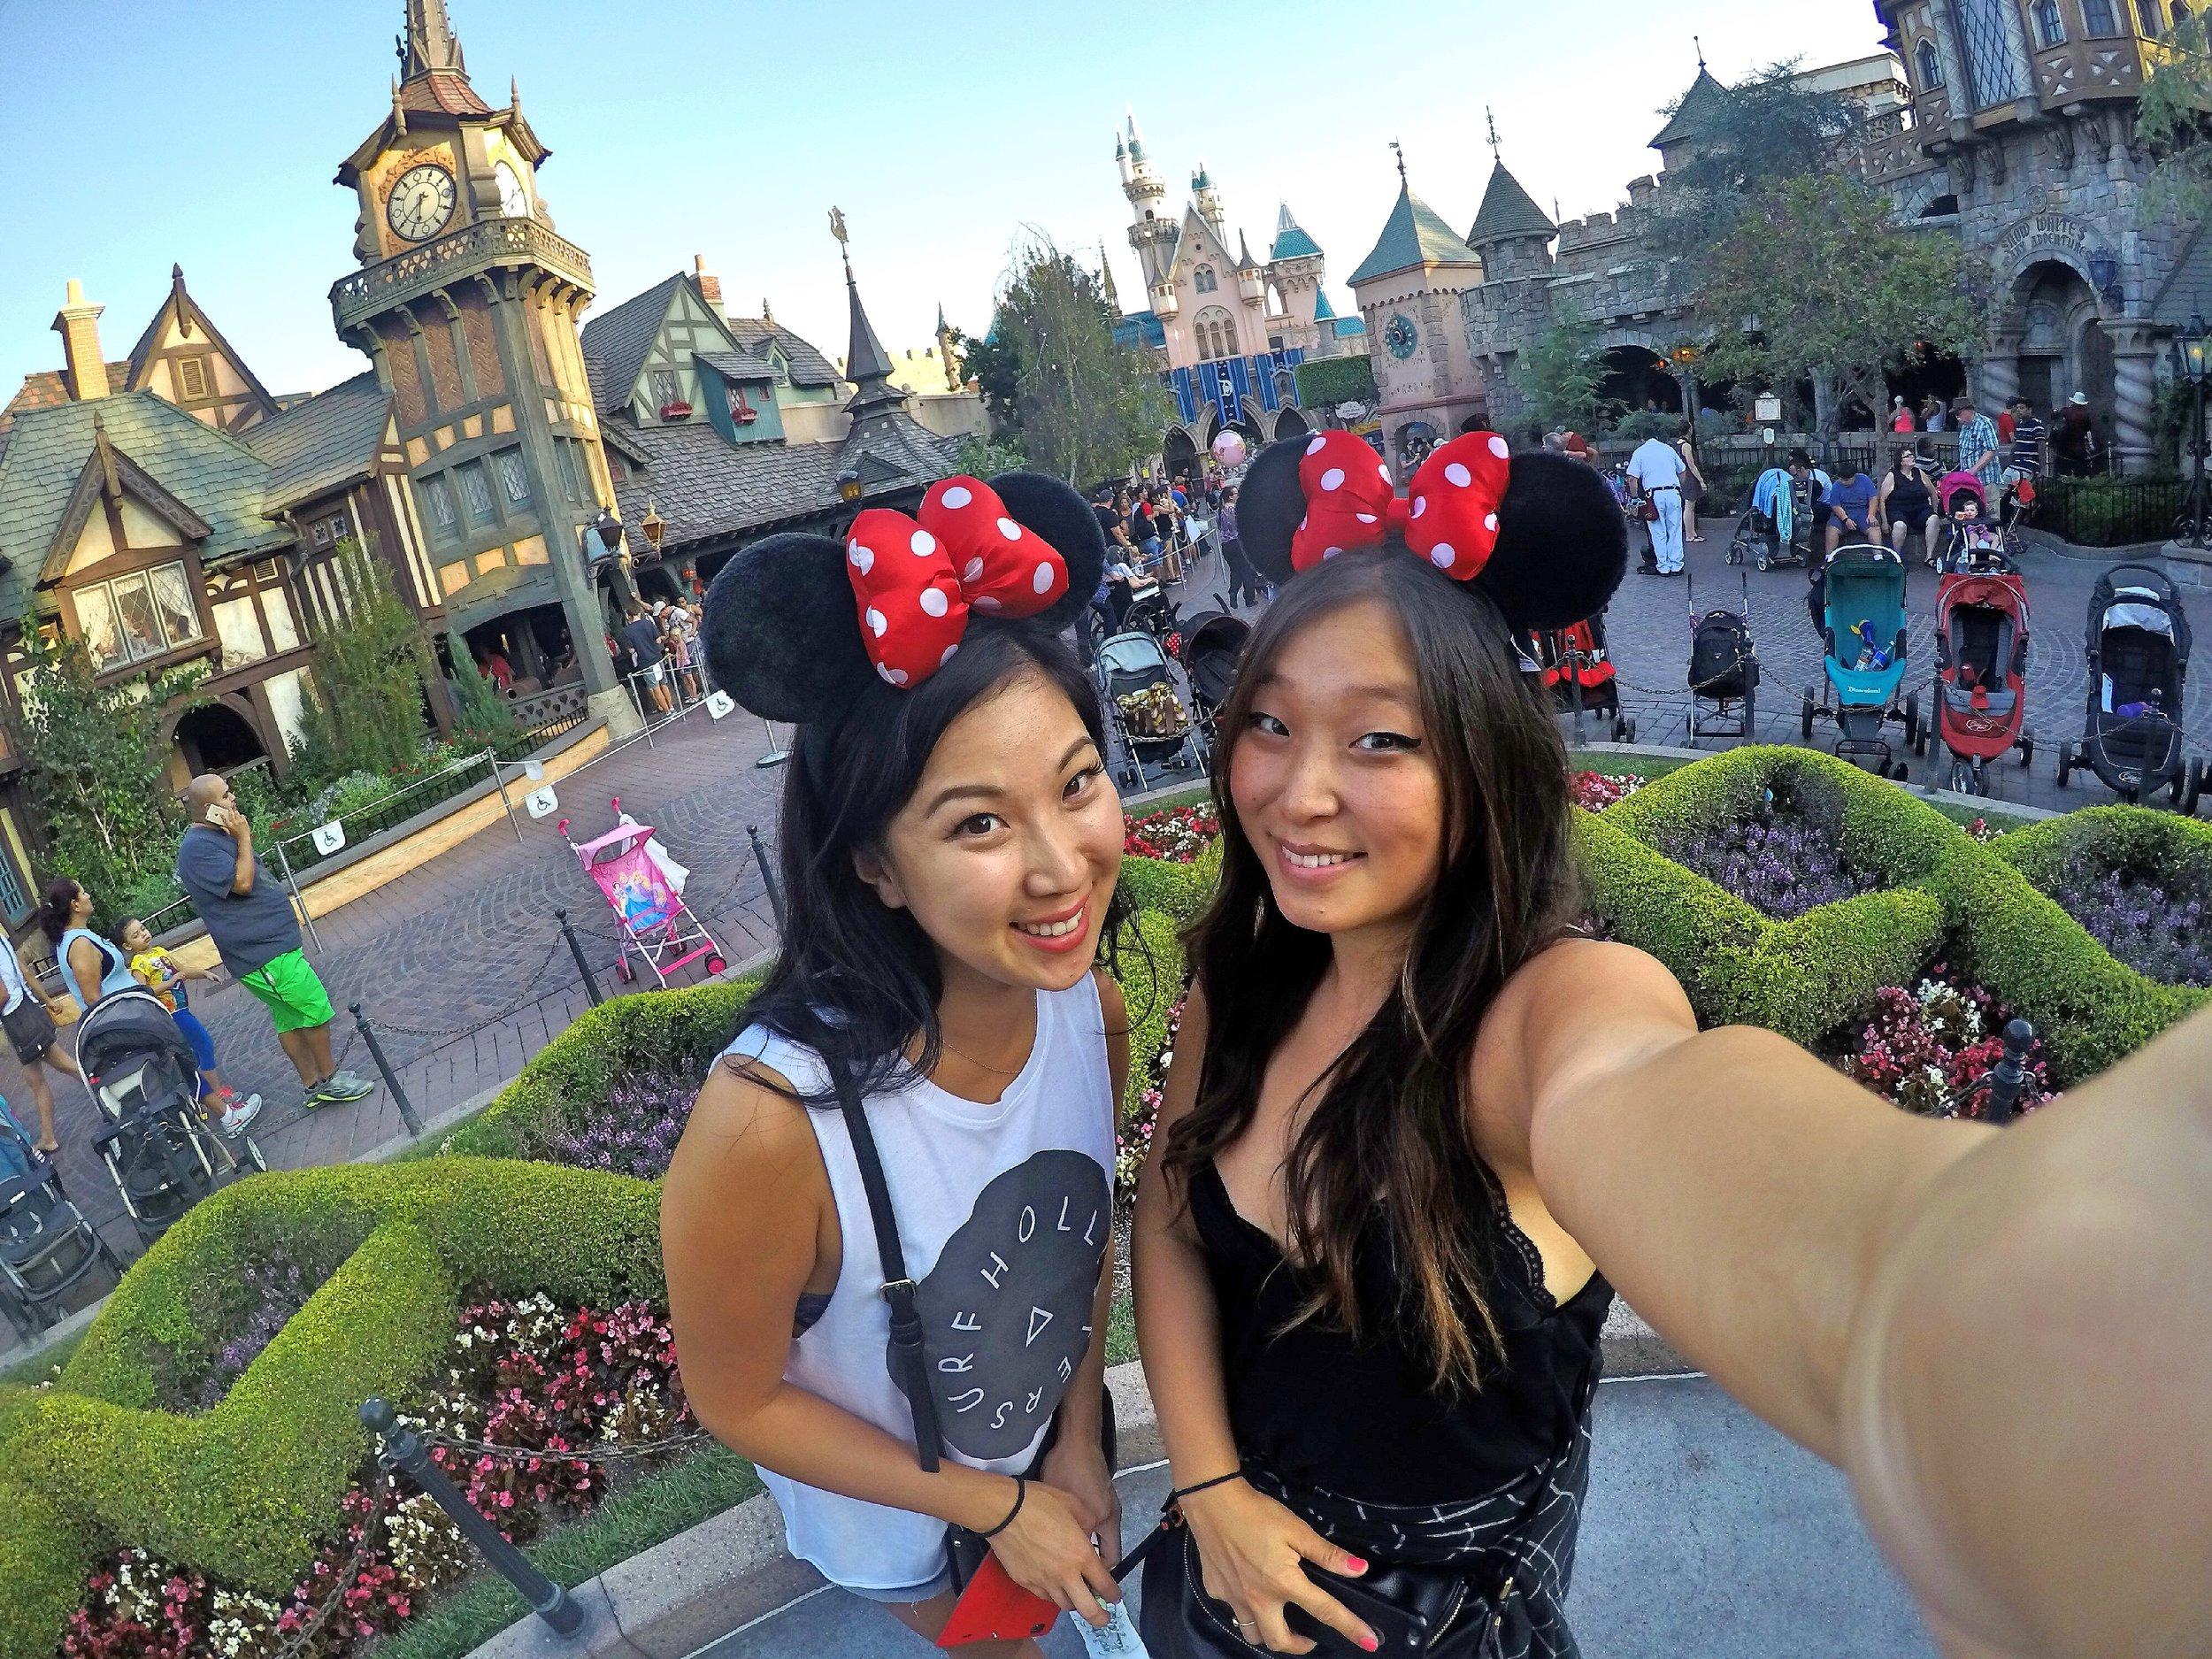 Disney Land, Los Angeles, USA